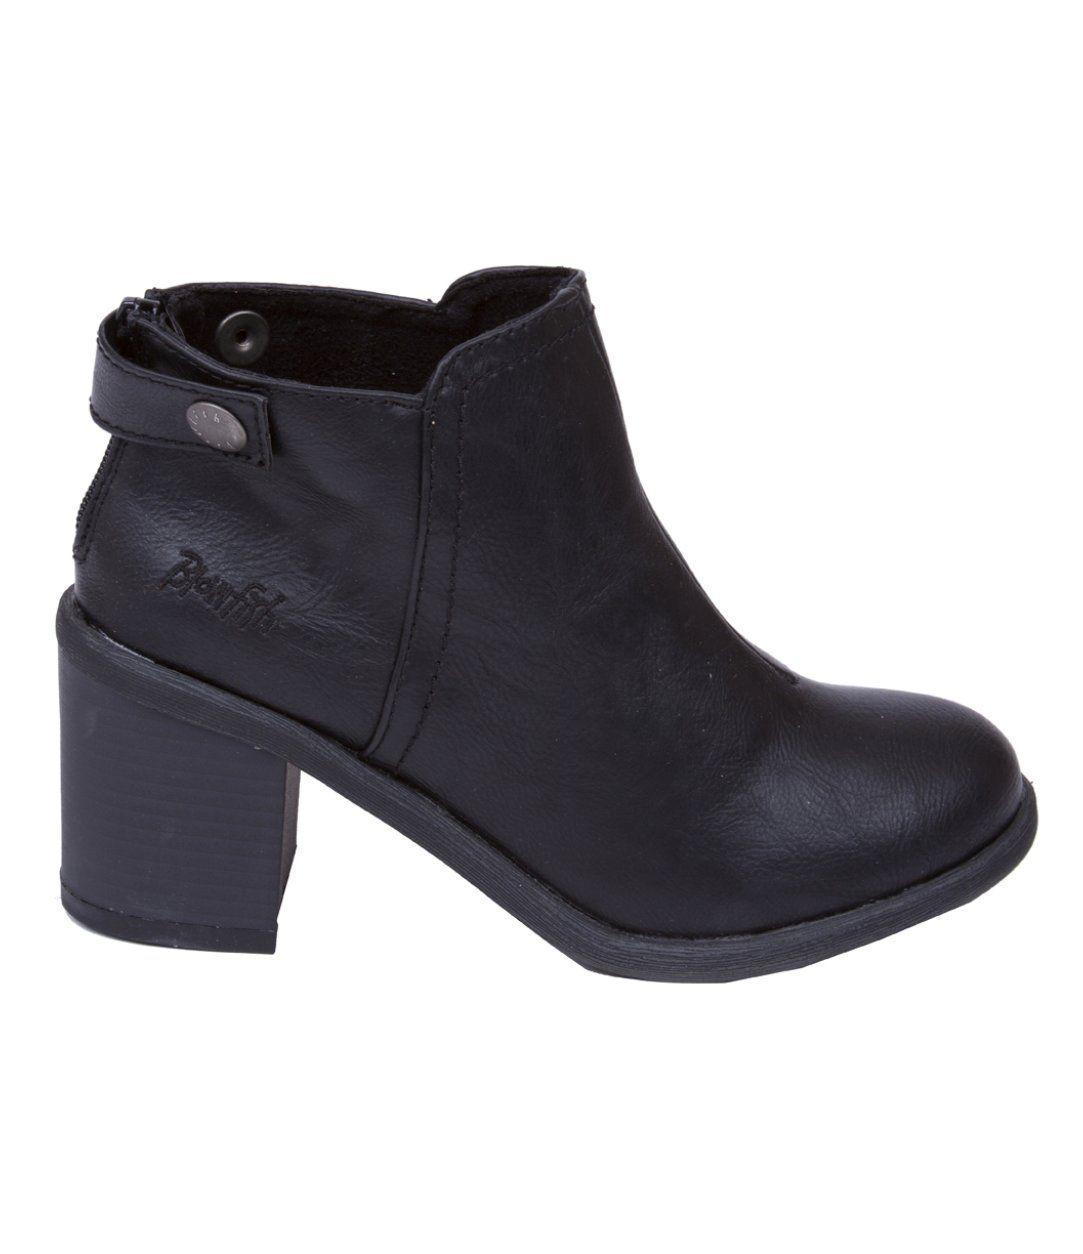 Marra | Blowfish Shoes